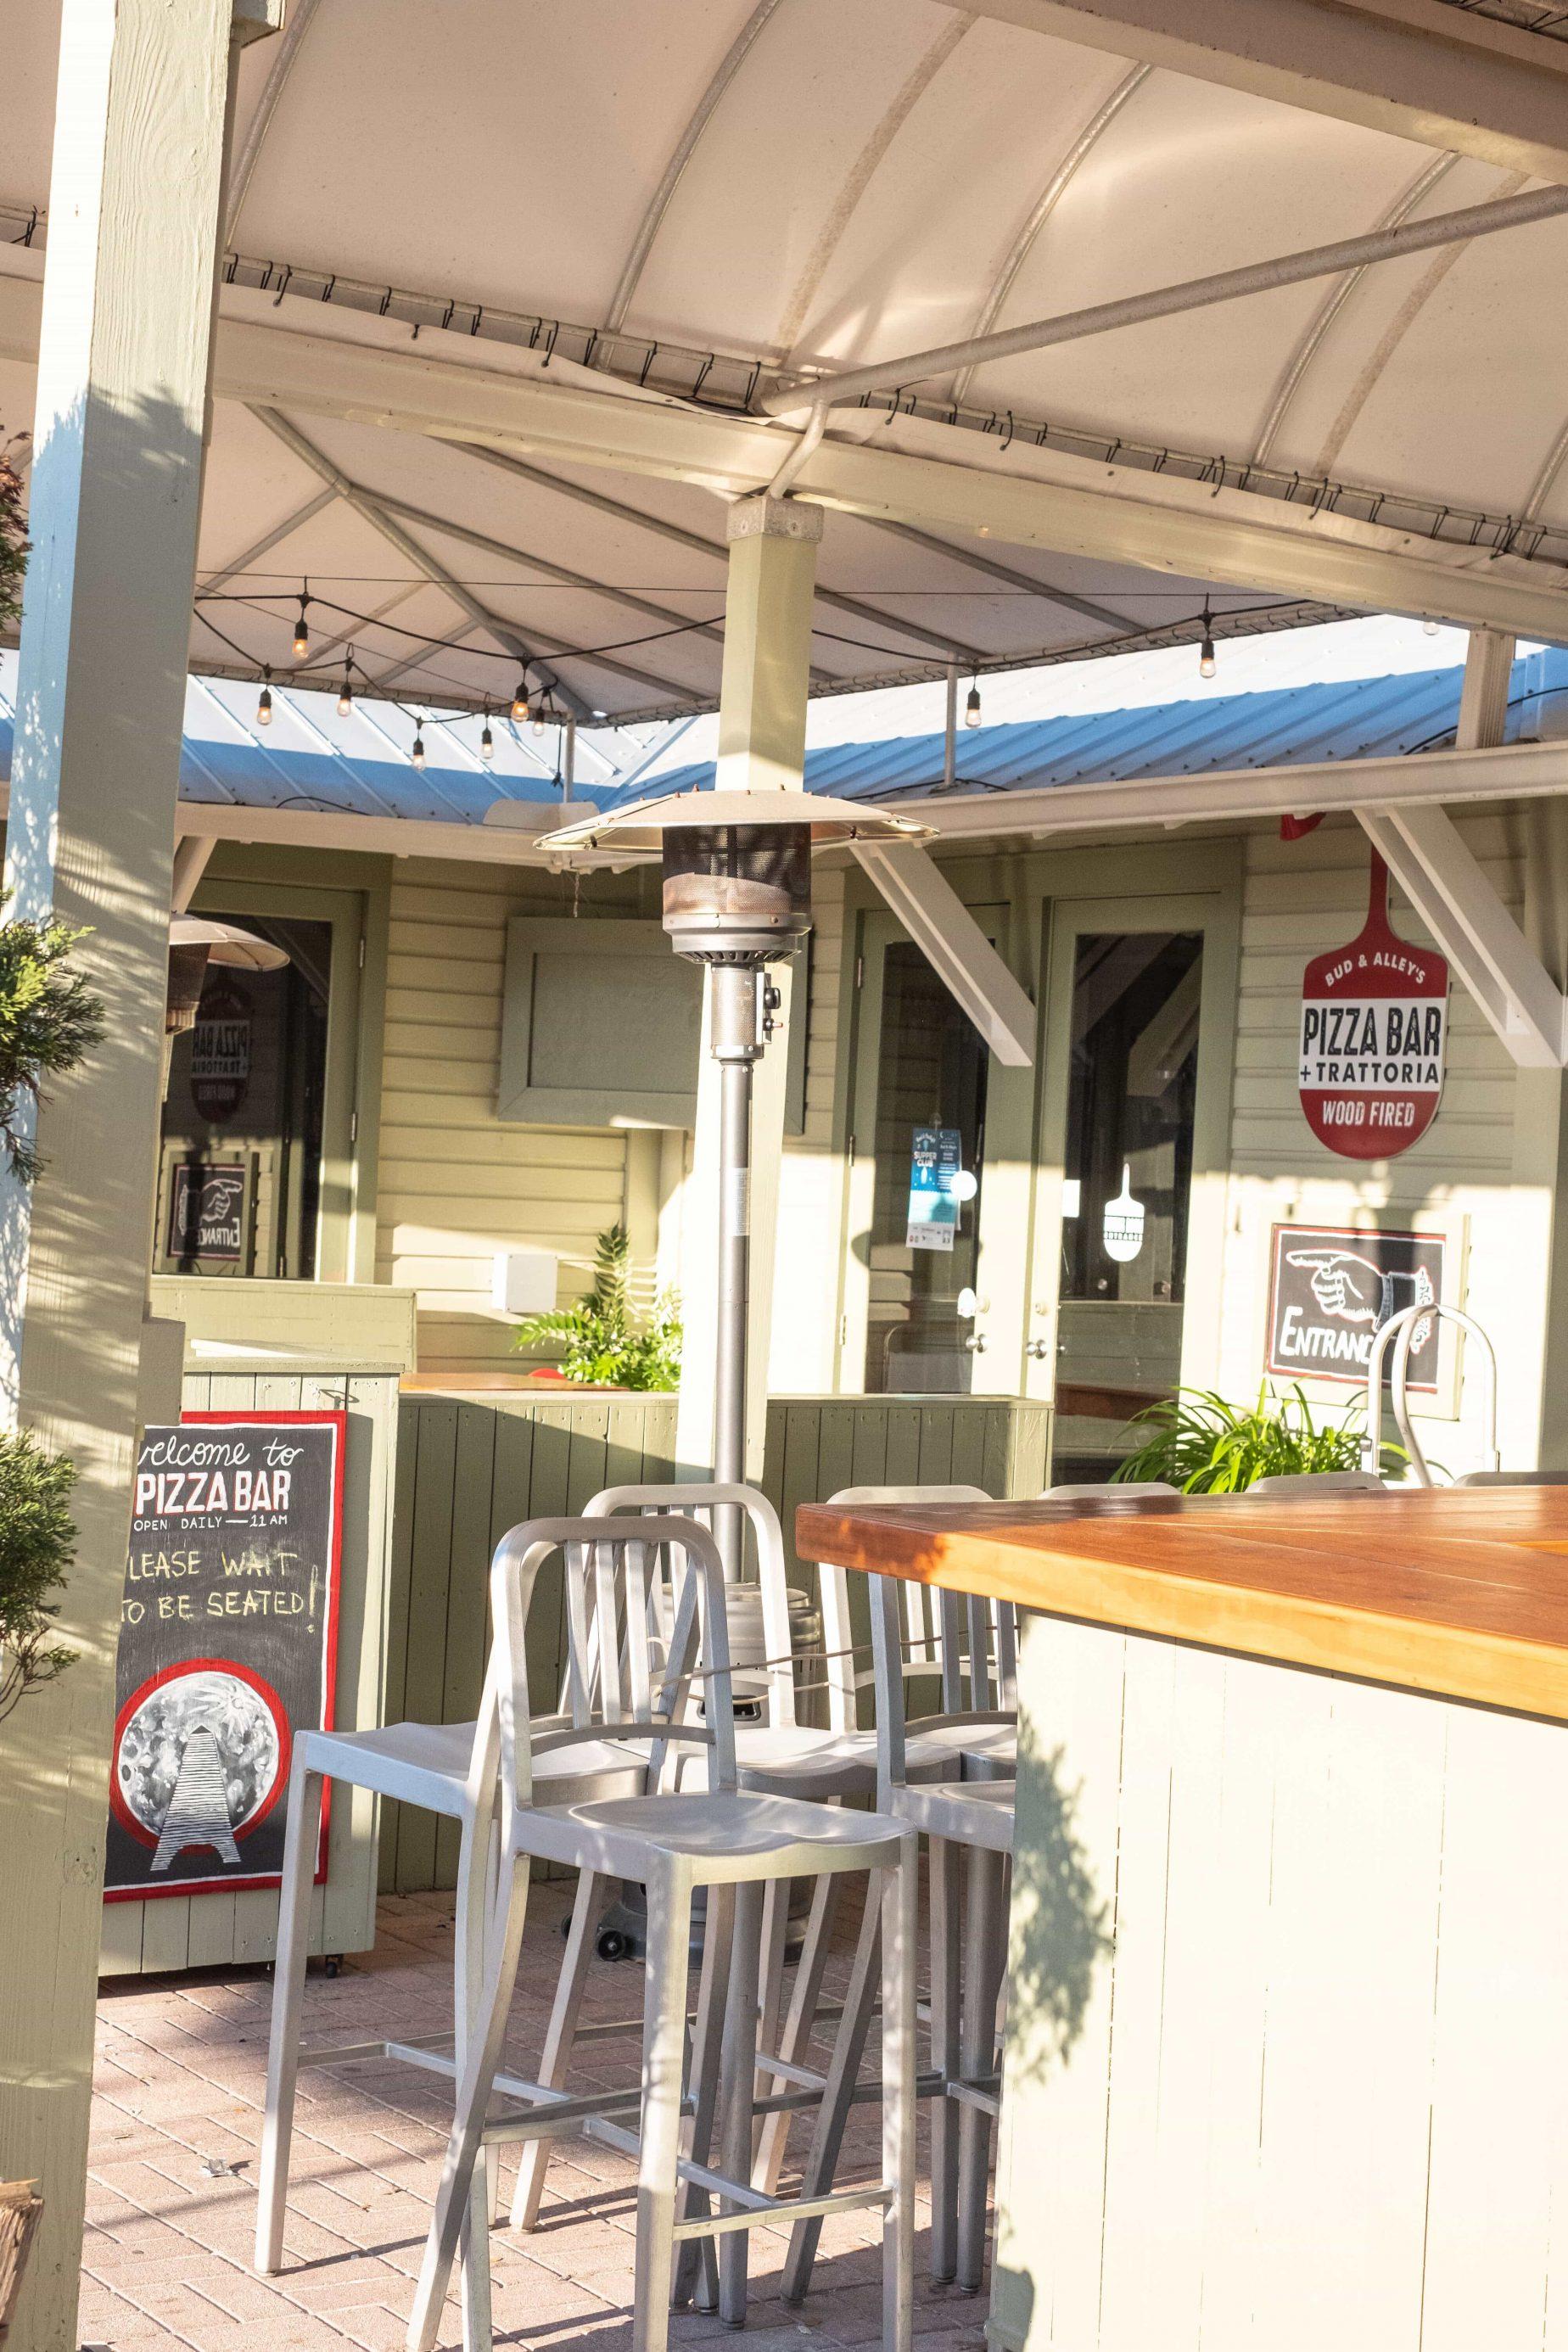 Gluten Free Options In Seaside Florida #whatsavvysaid #seasideflorida #glutenfree #seaside #budandalleyspizzabar